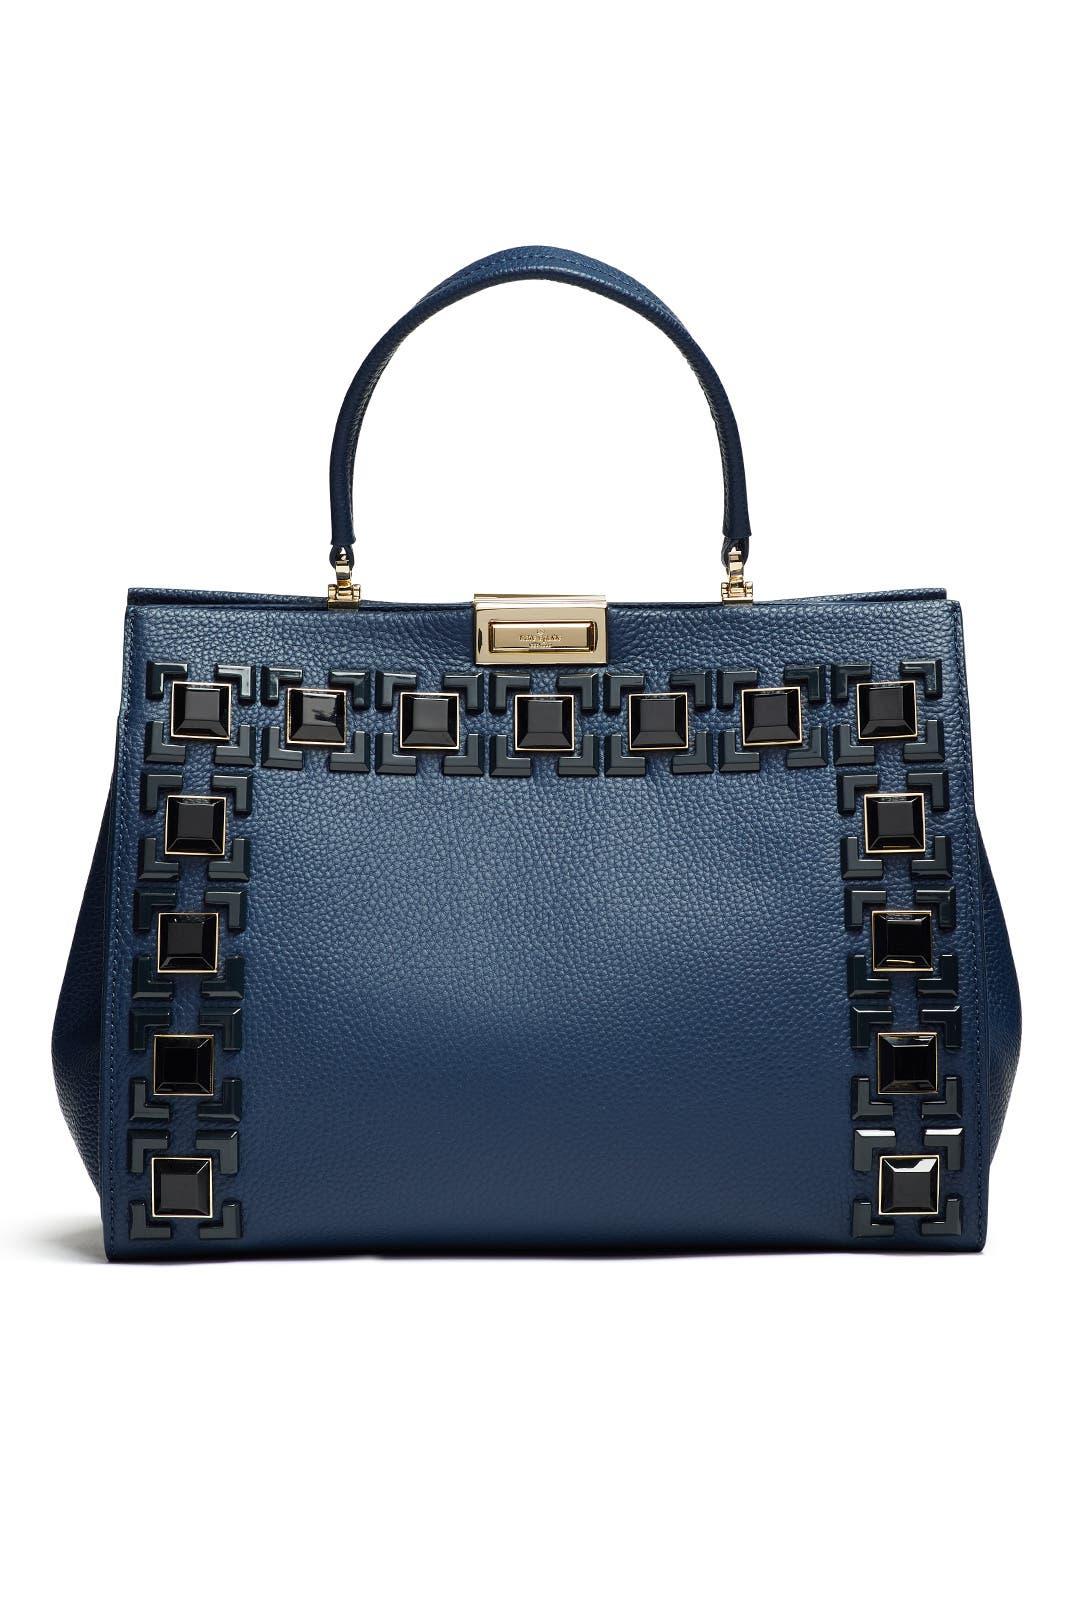 Shoulder Bag for Women, Black, Leather, 2017, one size Kate Spade New York